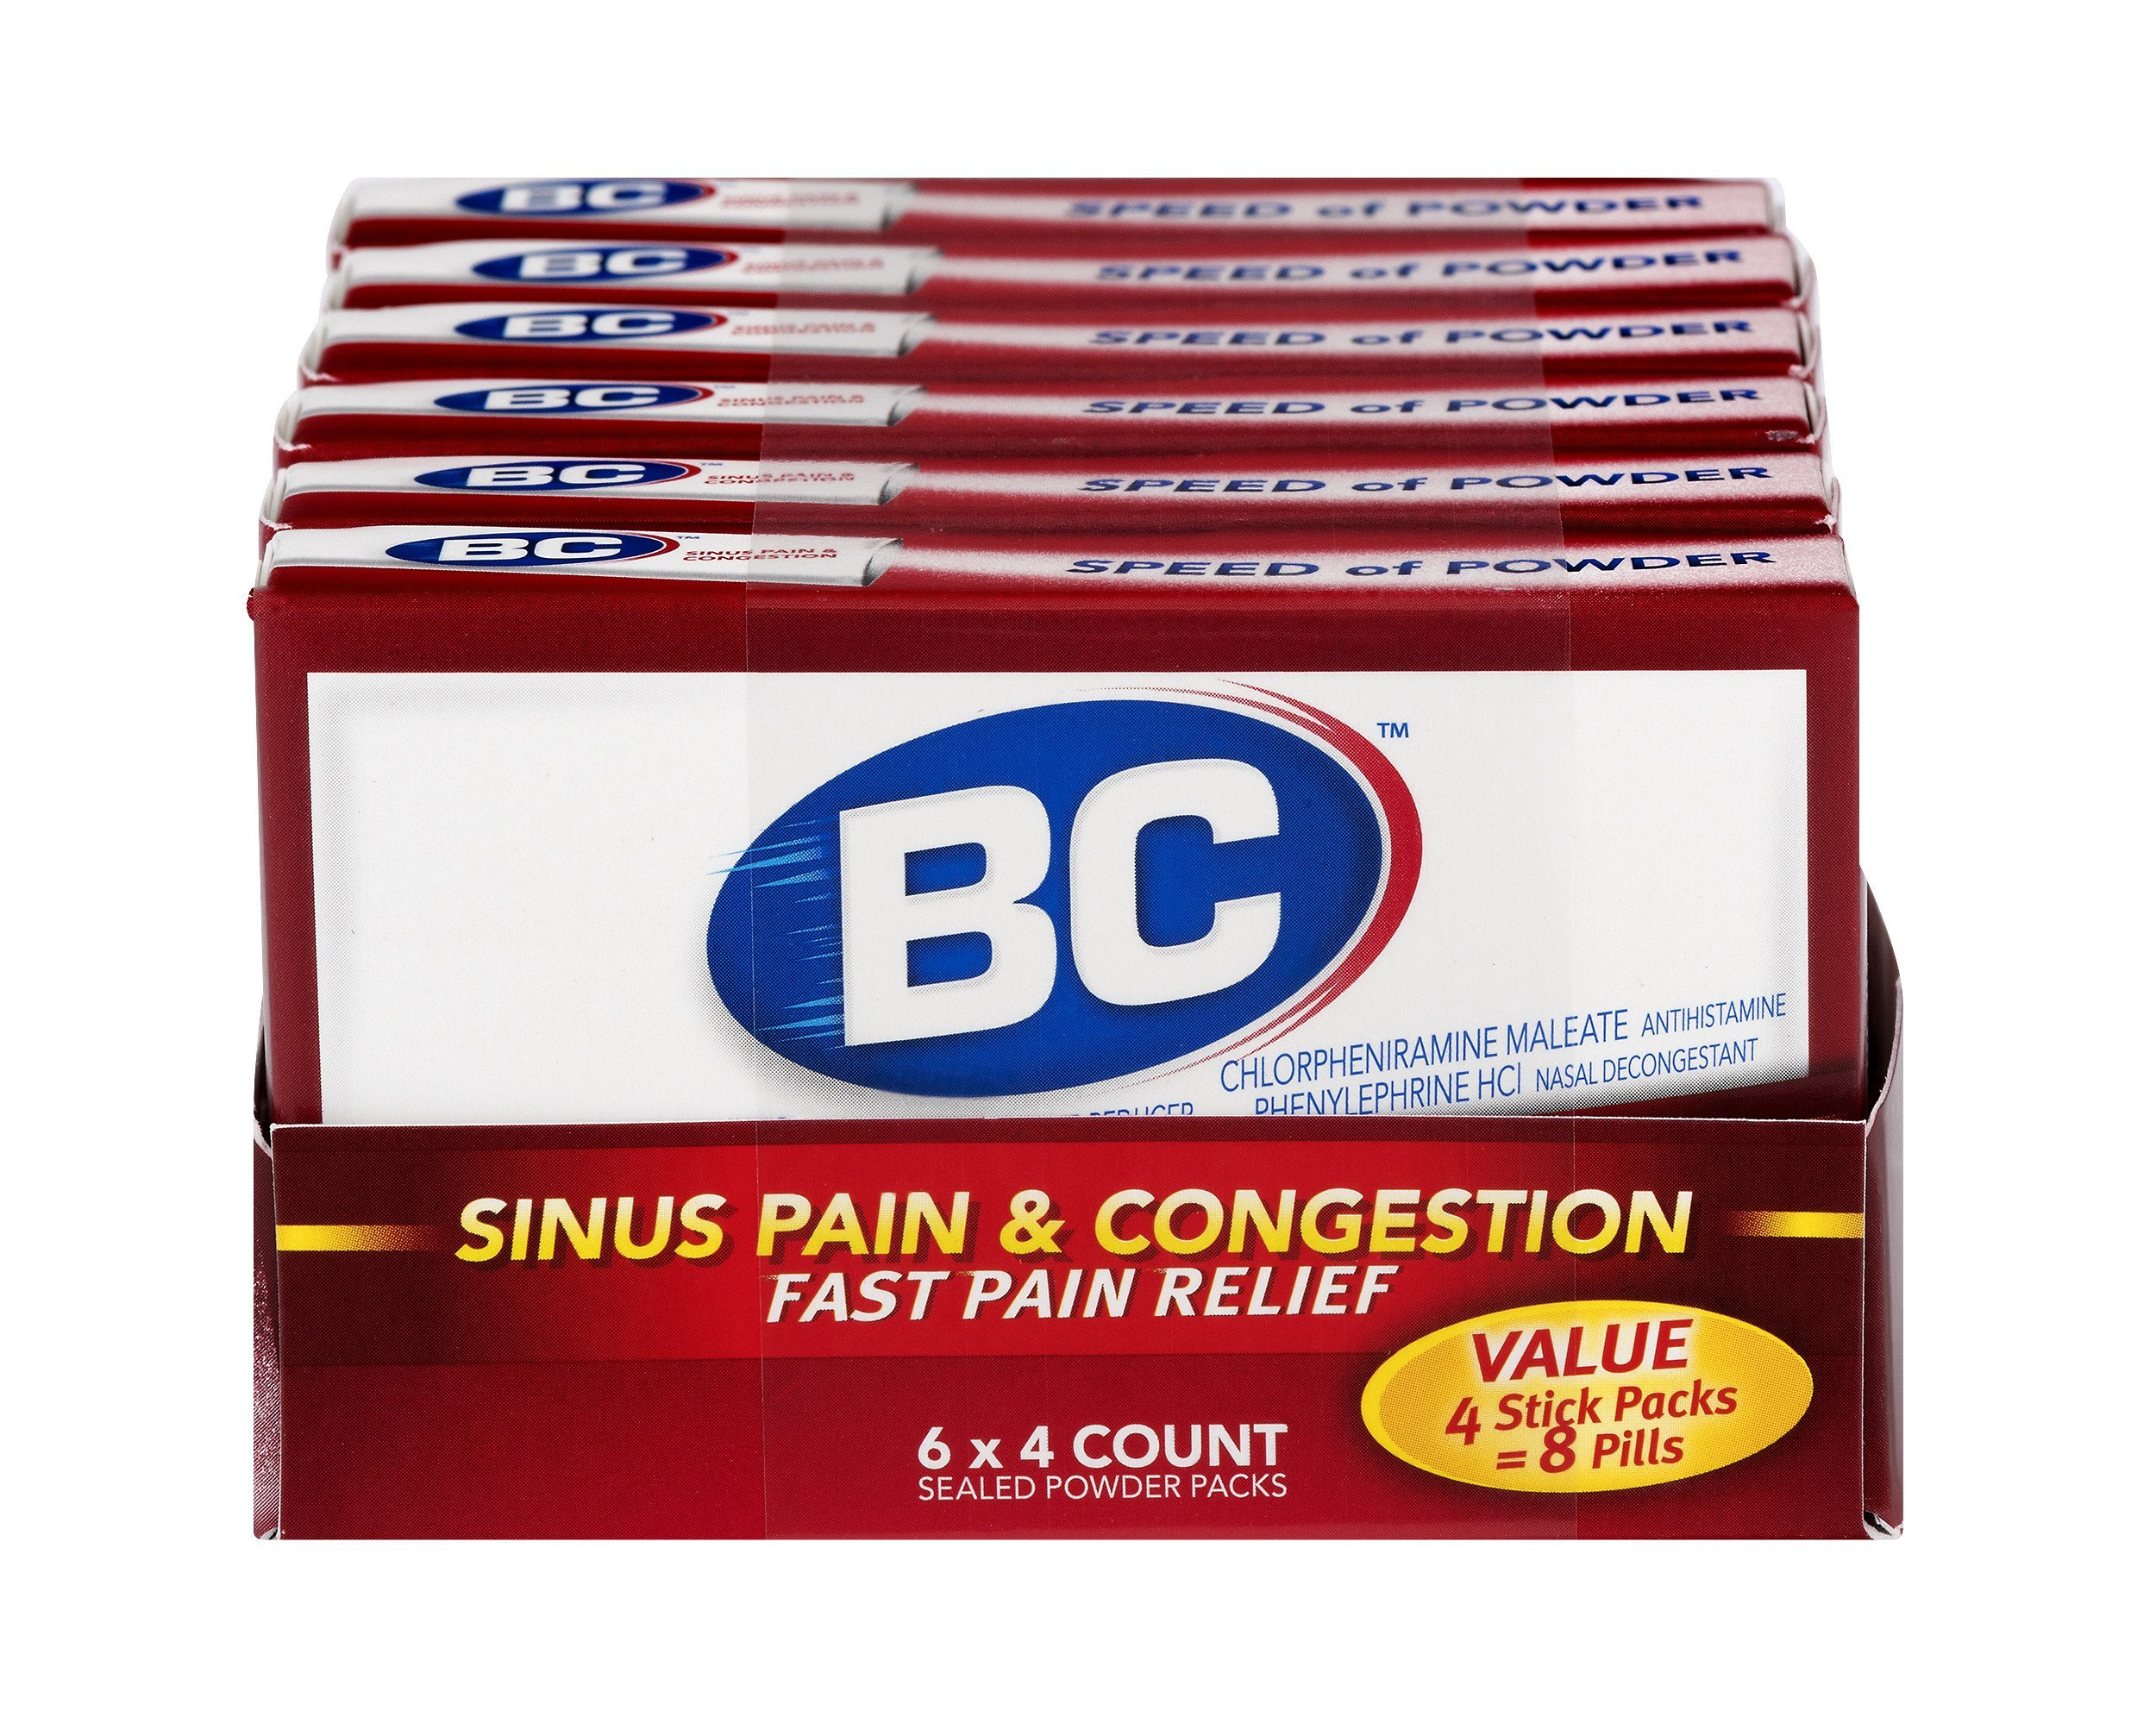 BC Sinus Pain & Congestion Powder Stick Packs 4ct | Pack of 6